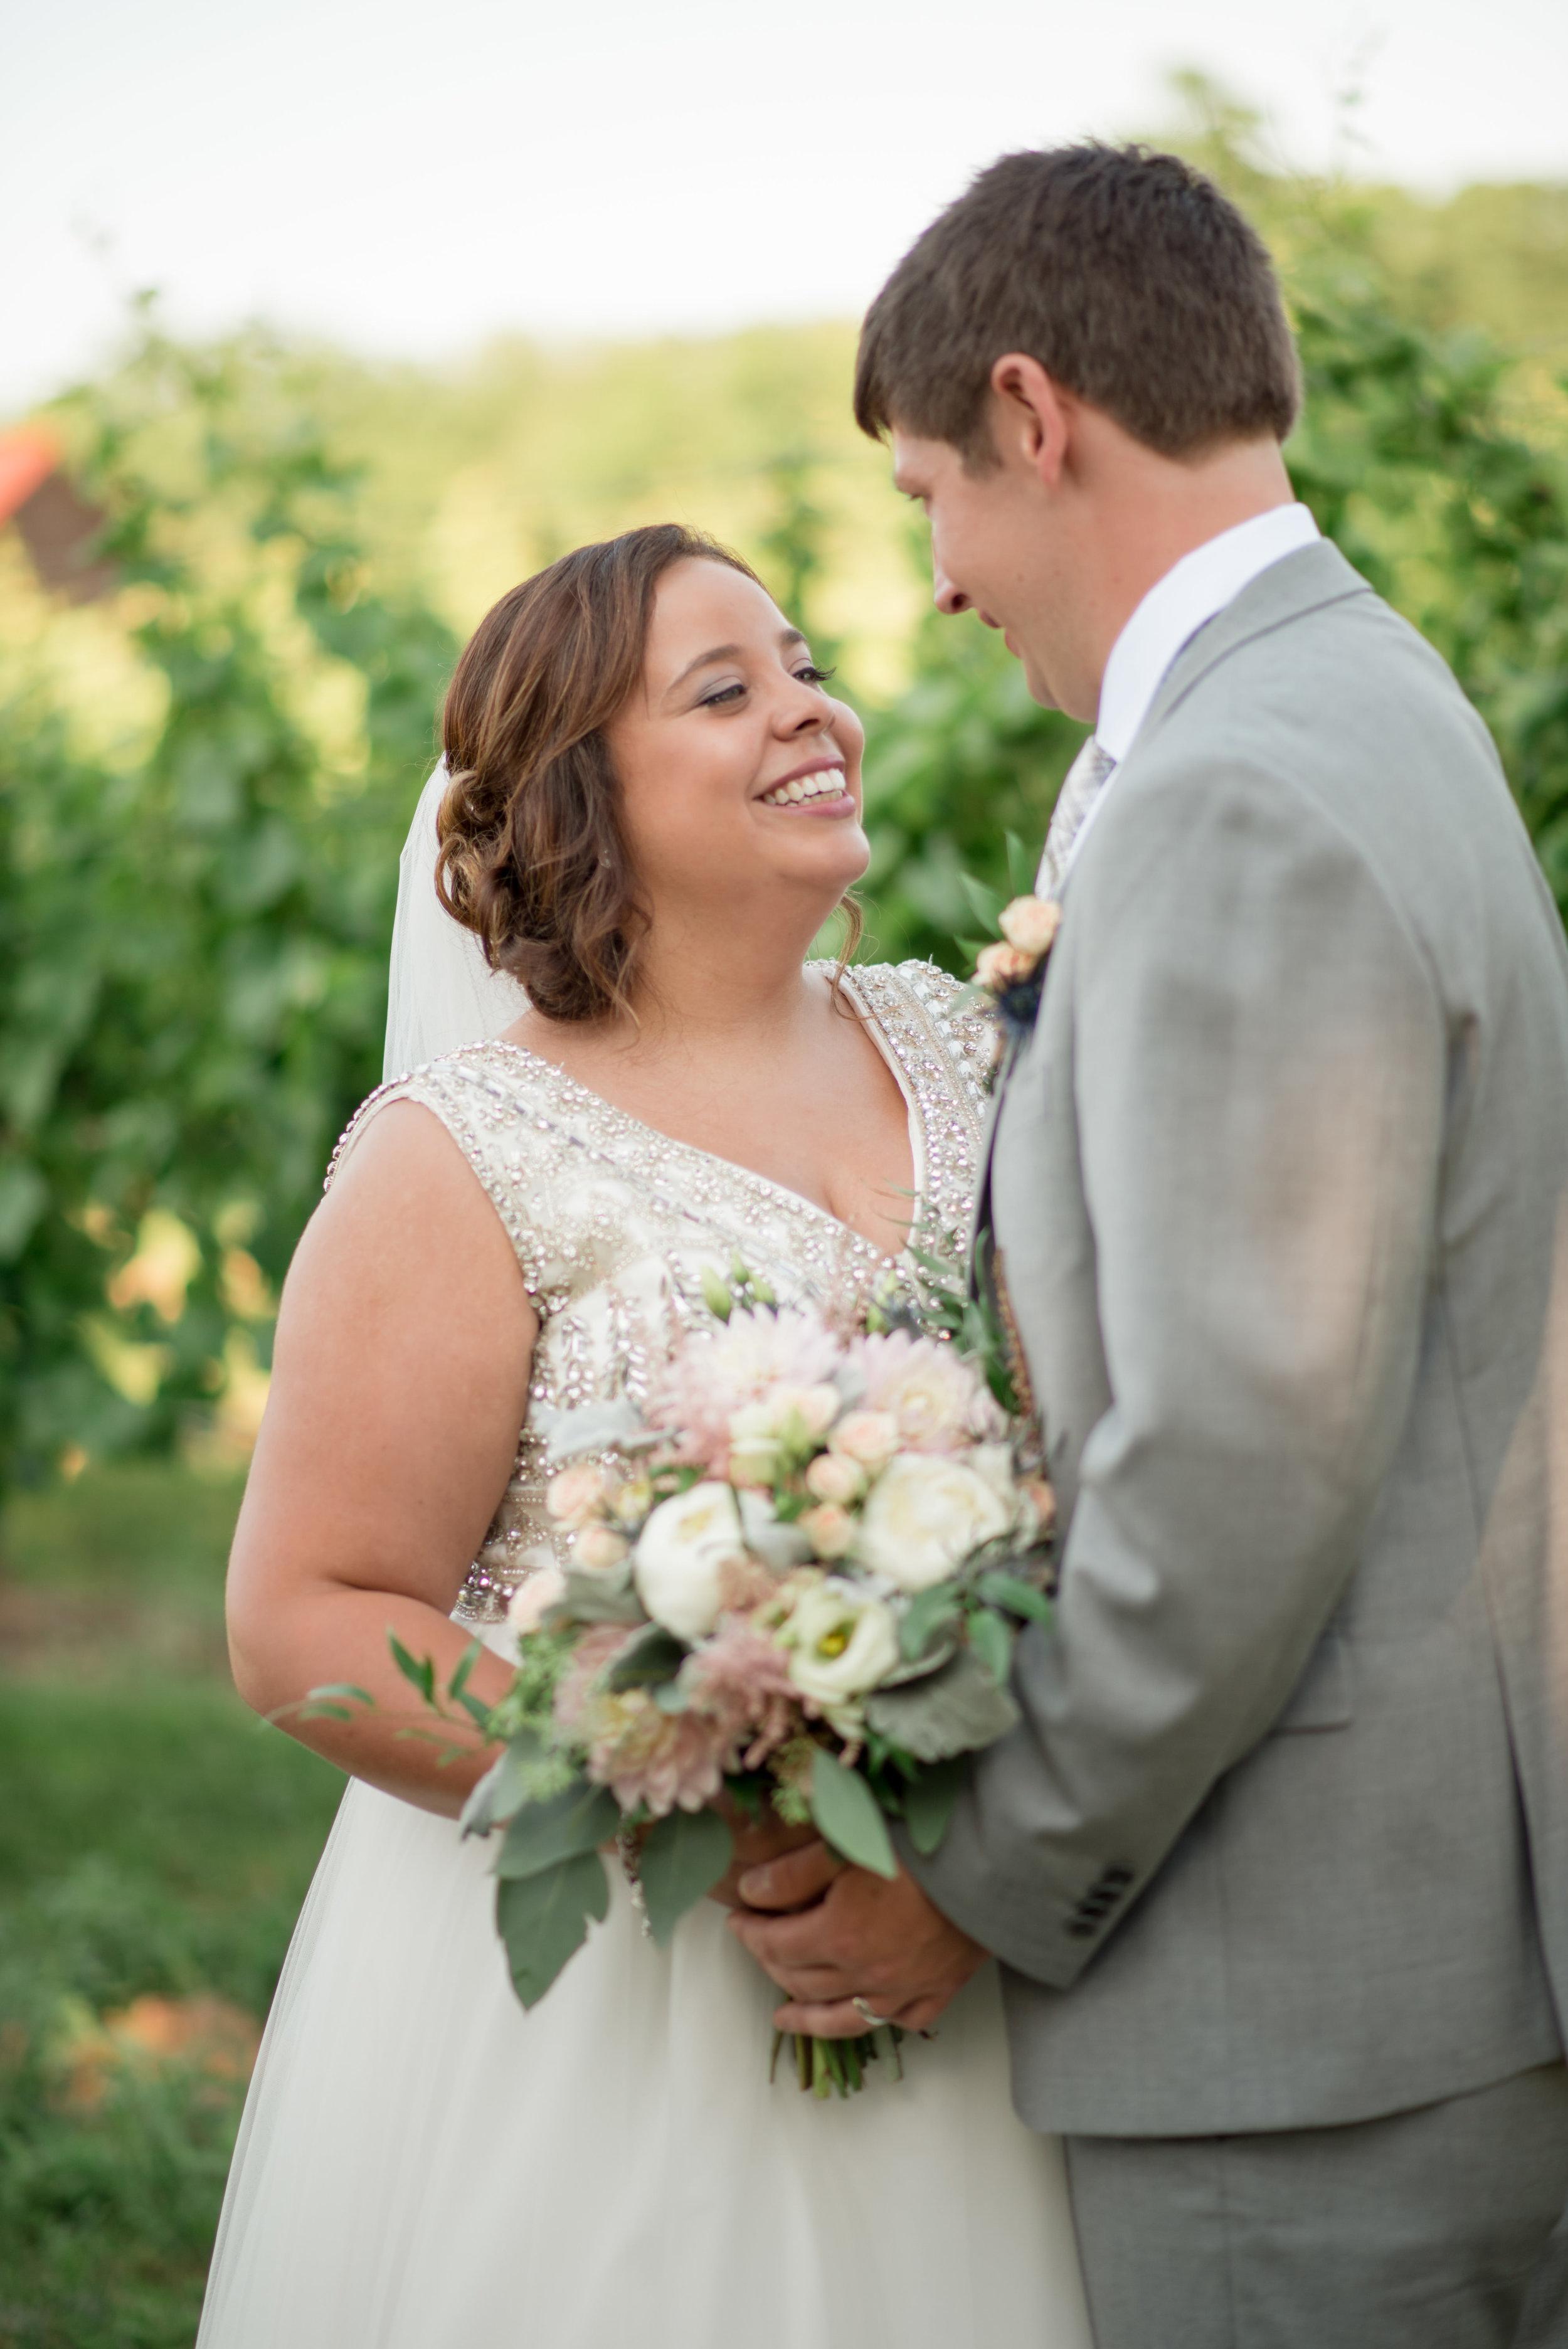 Kimberley + Cameron - Daniel Ricci Weddings - High Res. Finals-378.jpg